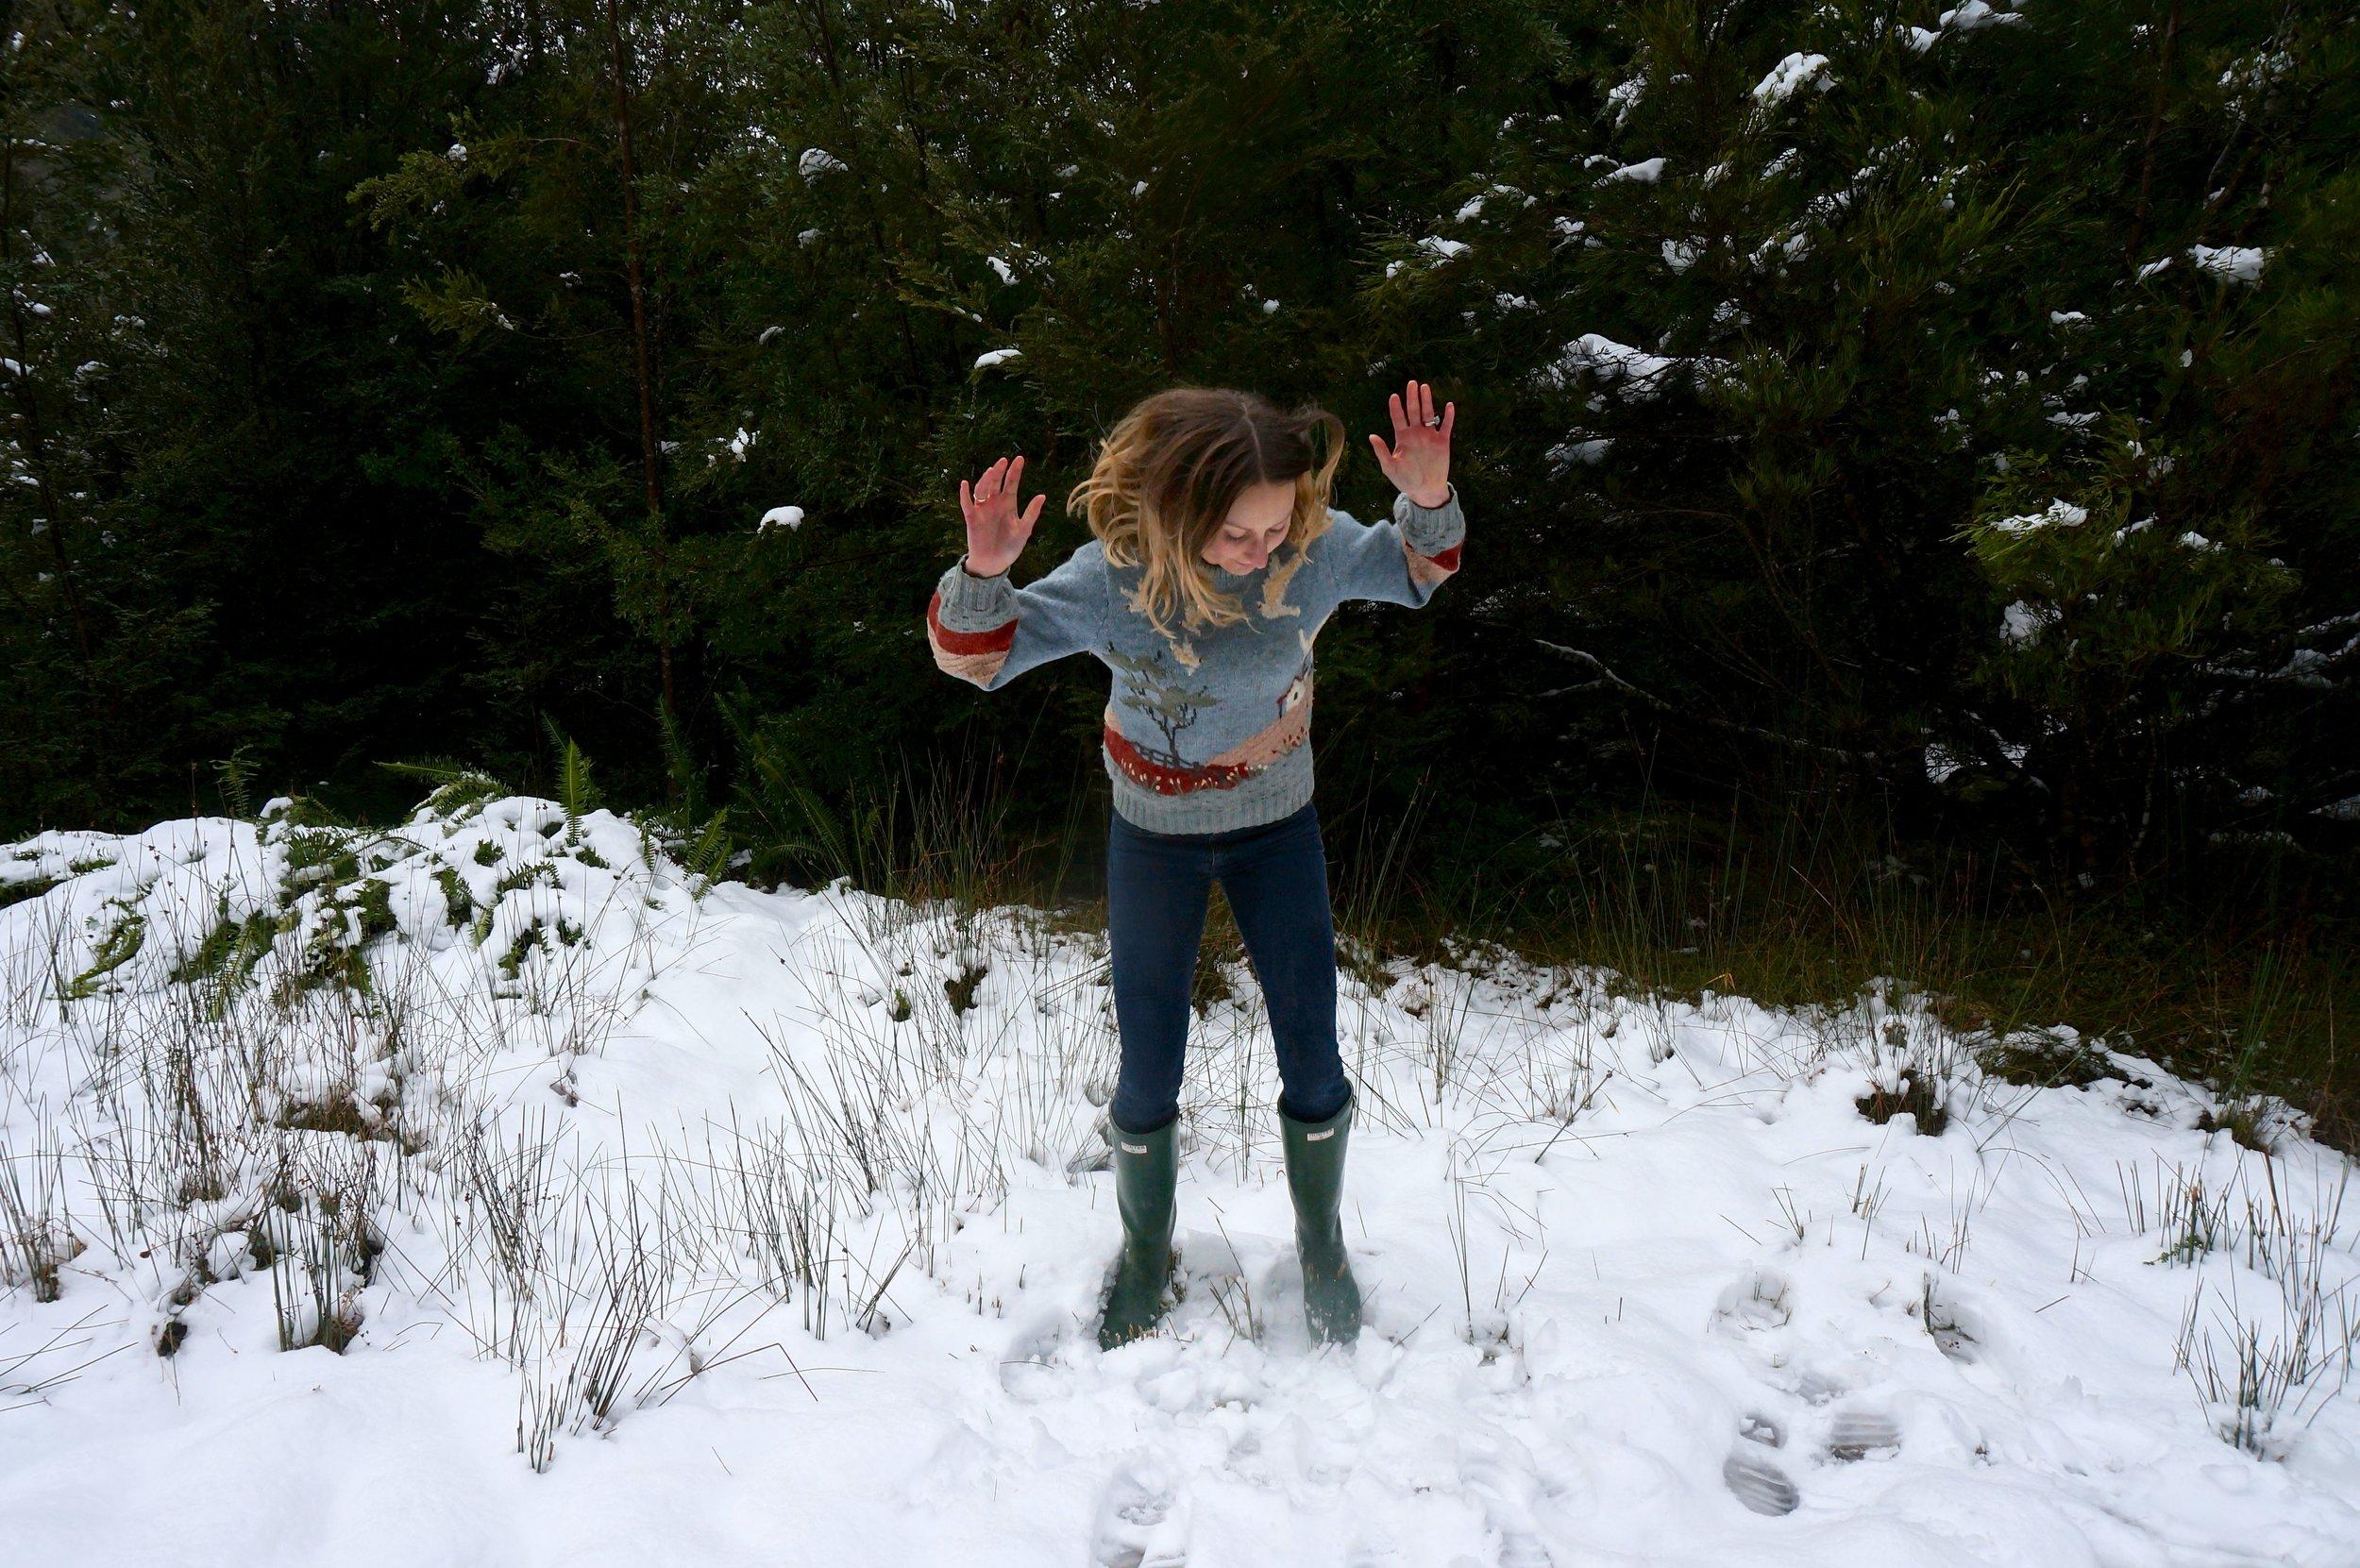 snow-Heidi-Sze-Apples-Under-My-Bed.jpg